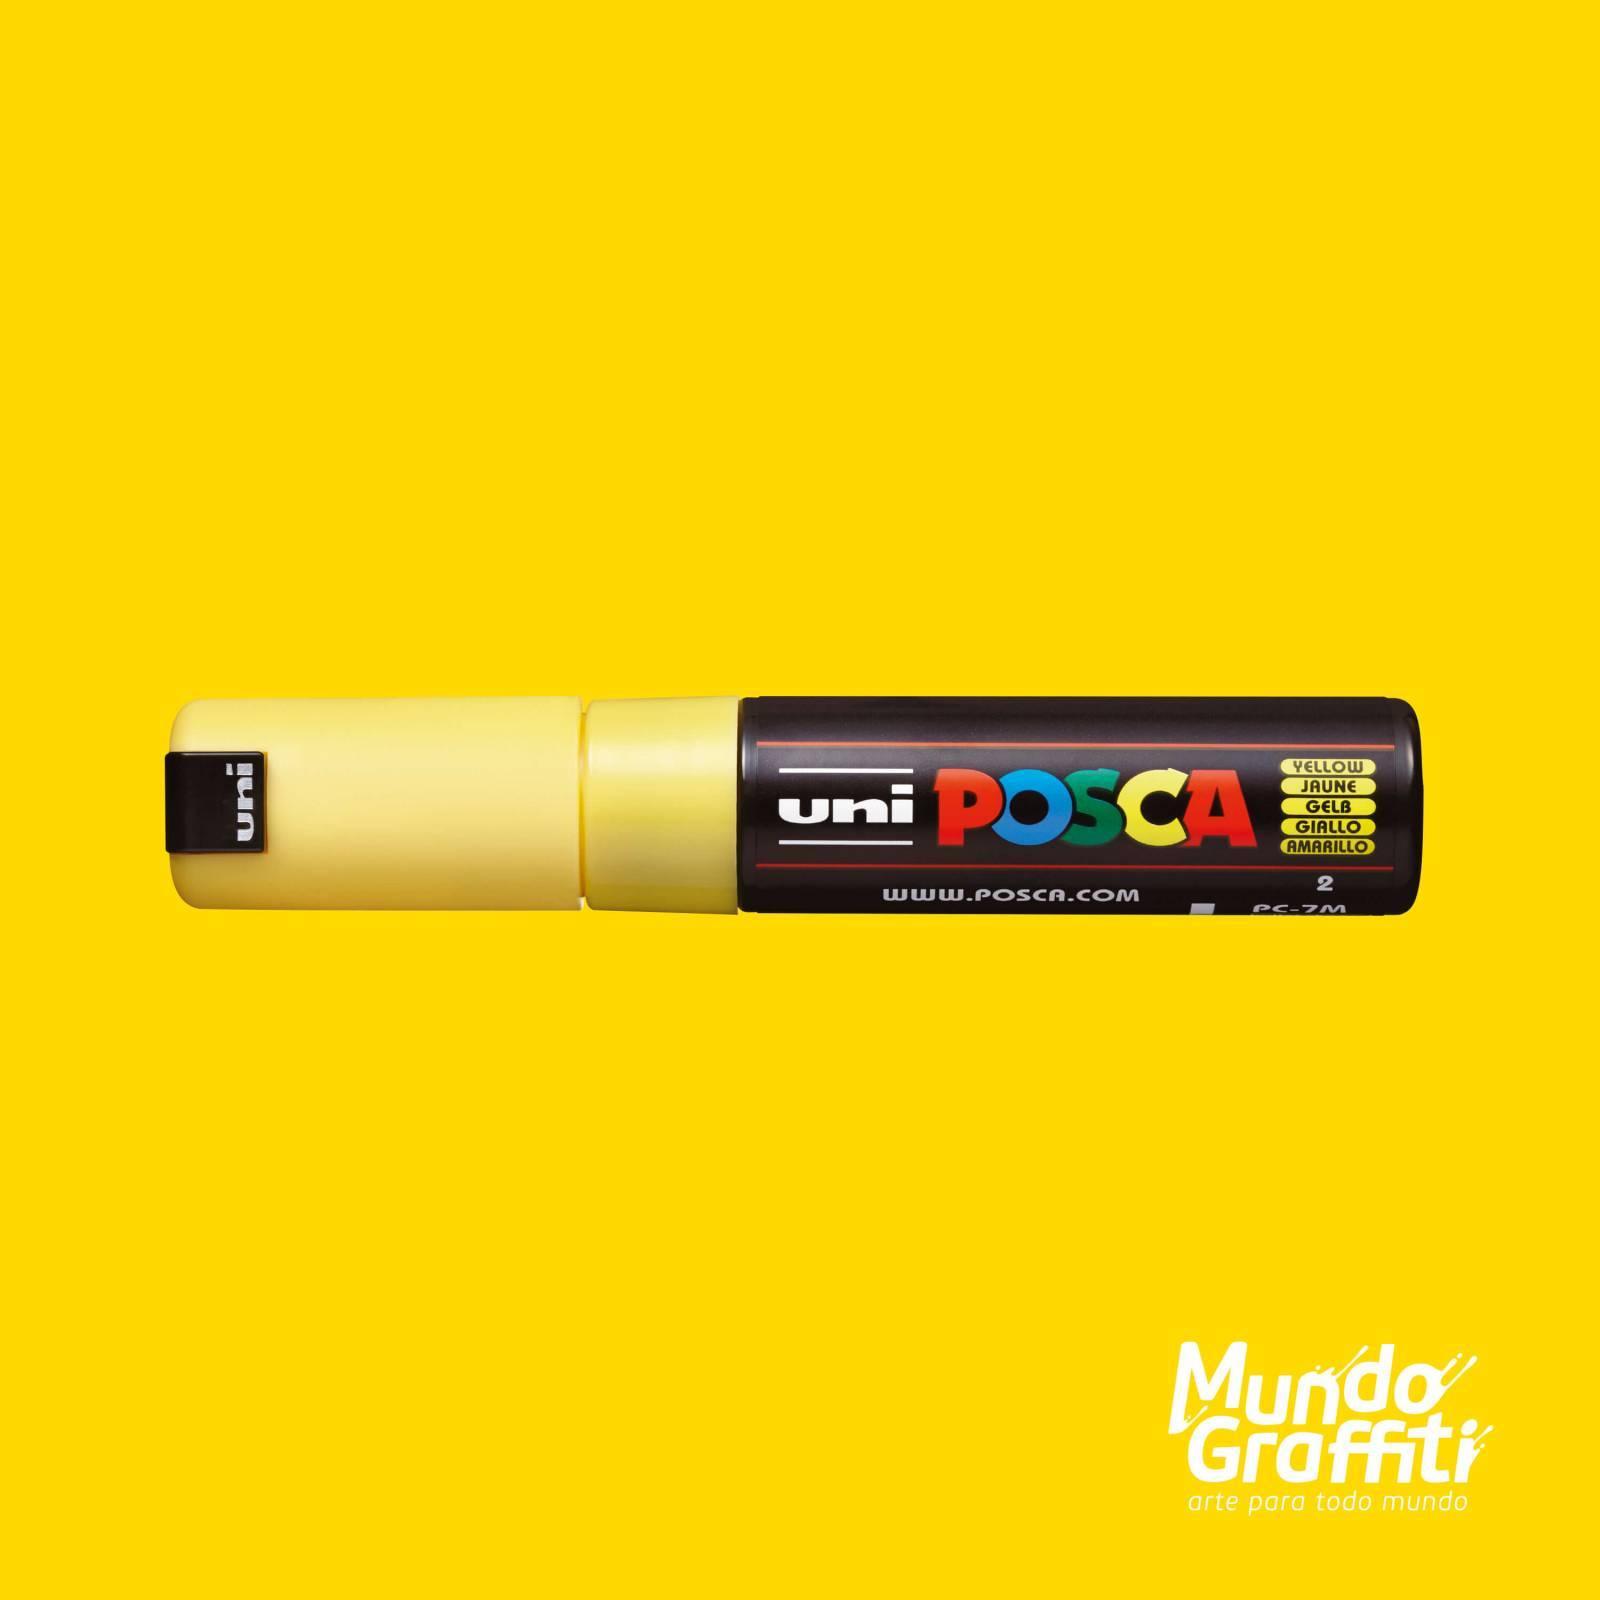 Caneta Posca 8K Amarelo - Mundo Graffiti